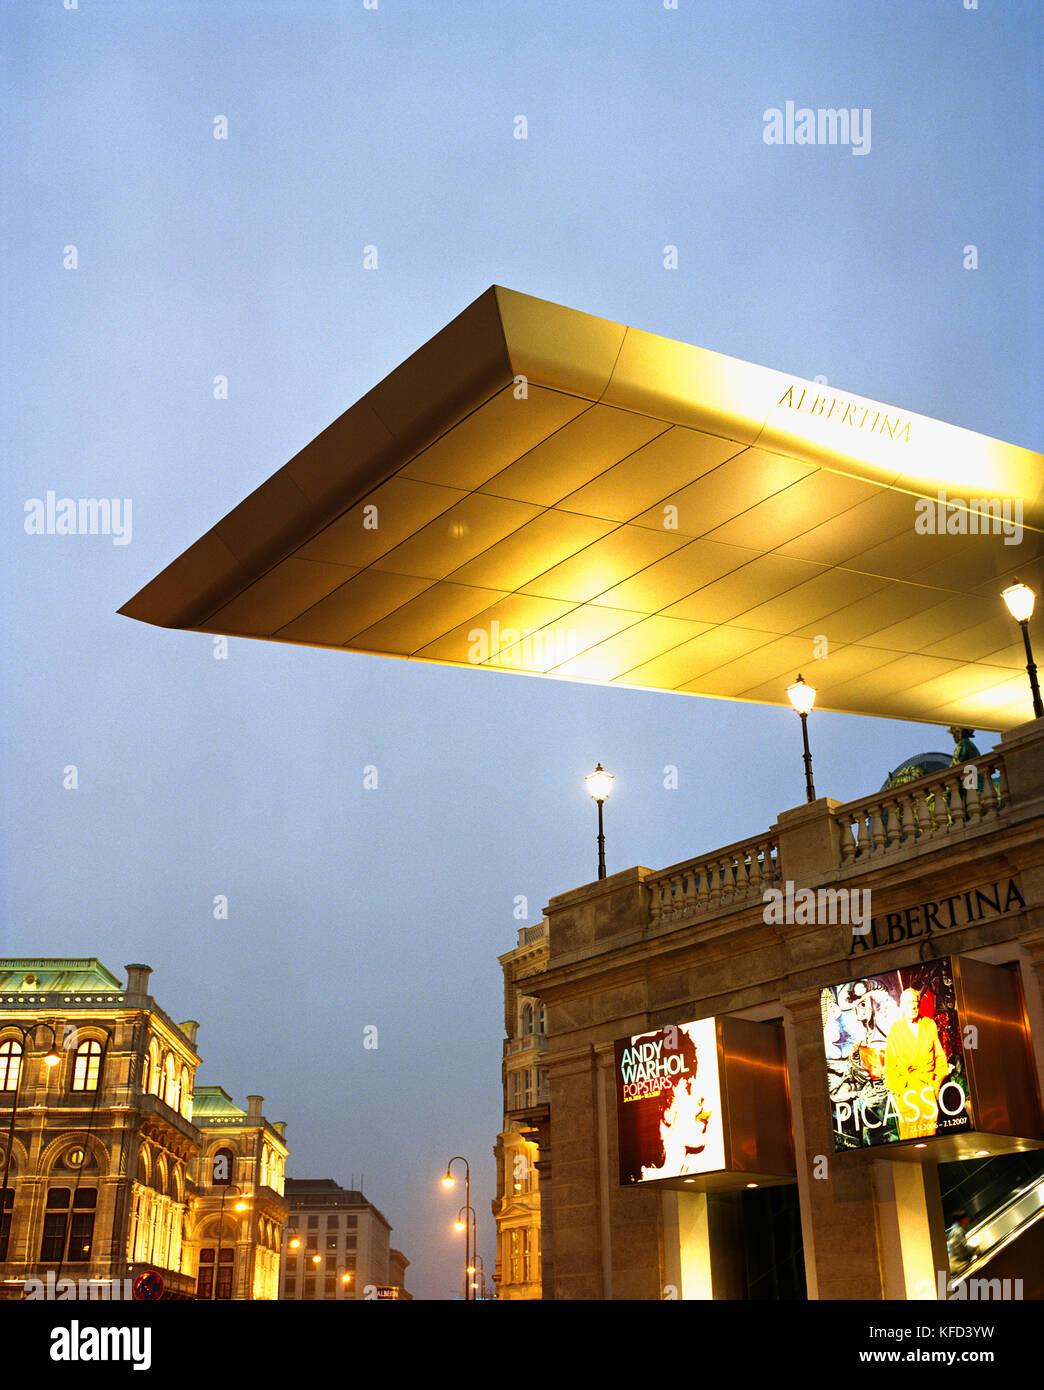 AUSTRIA, Vienna, The Albertina Museum at night - Stock Image